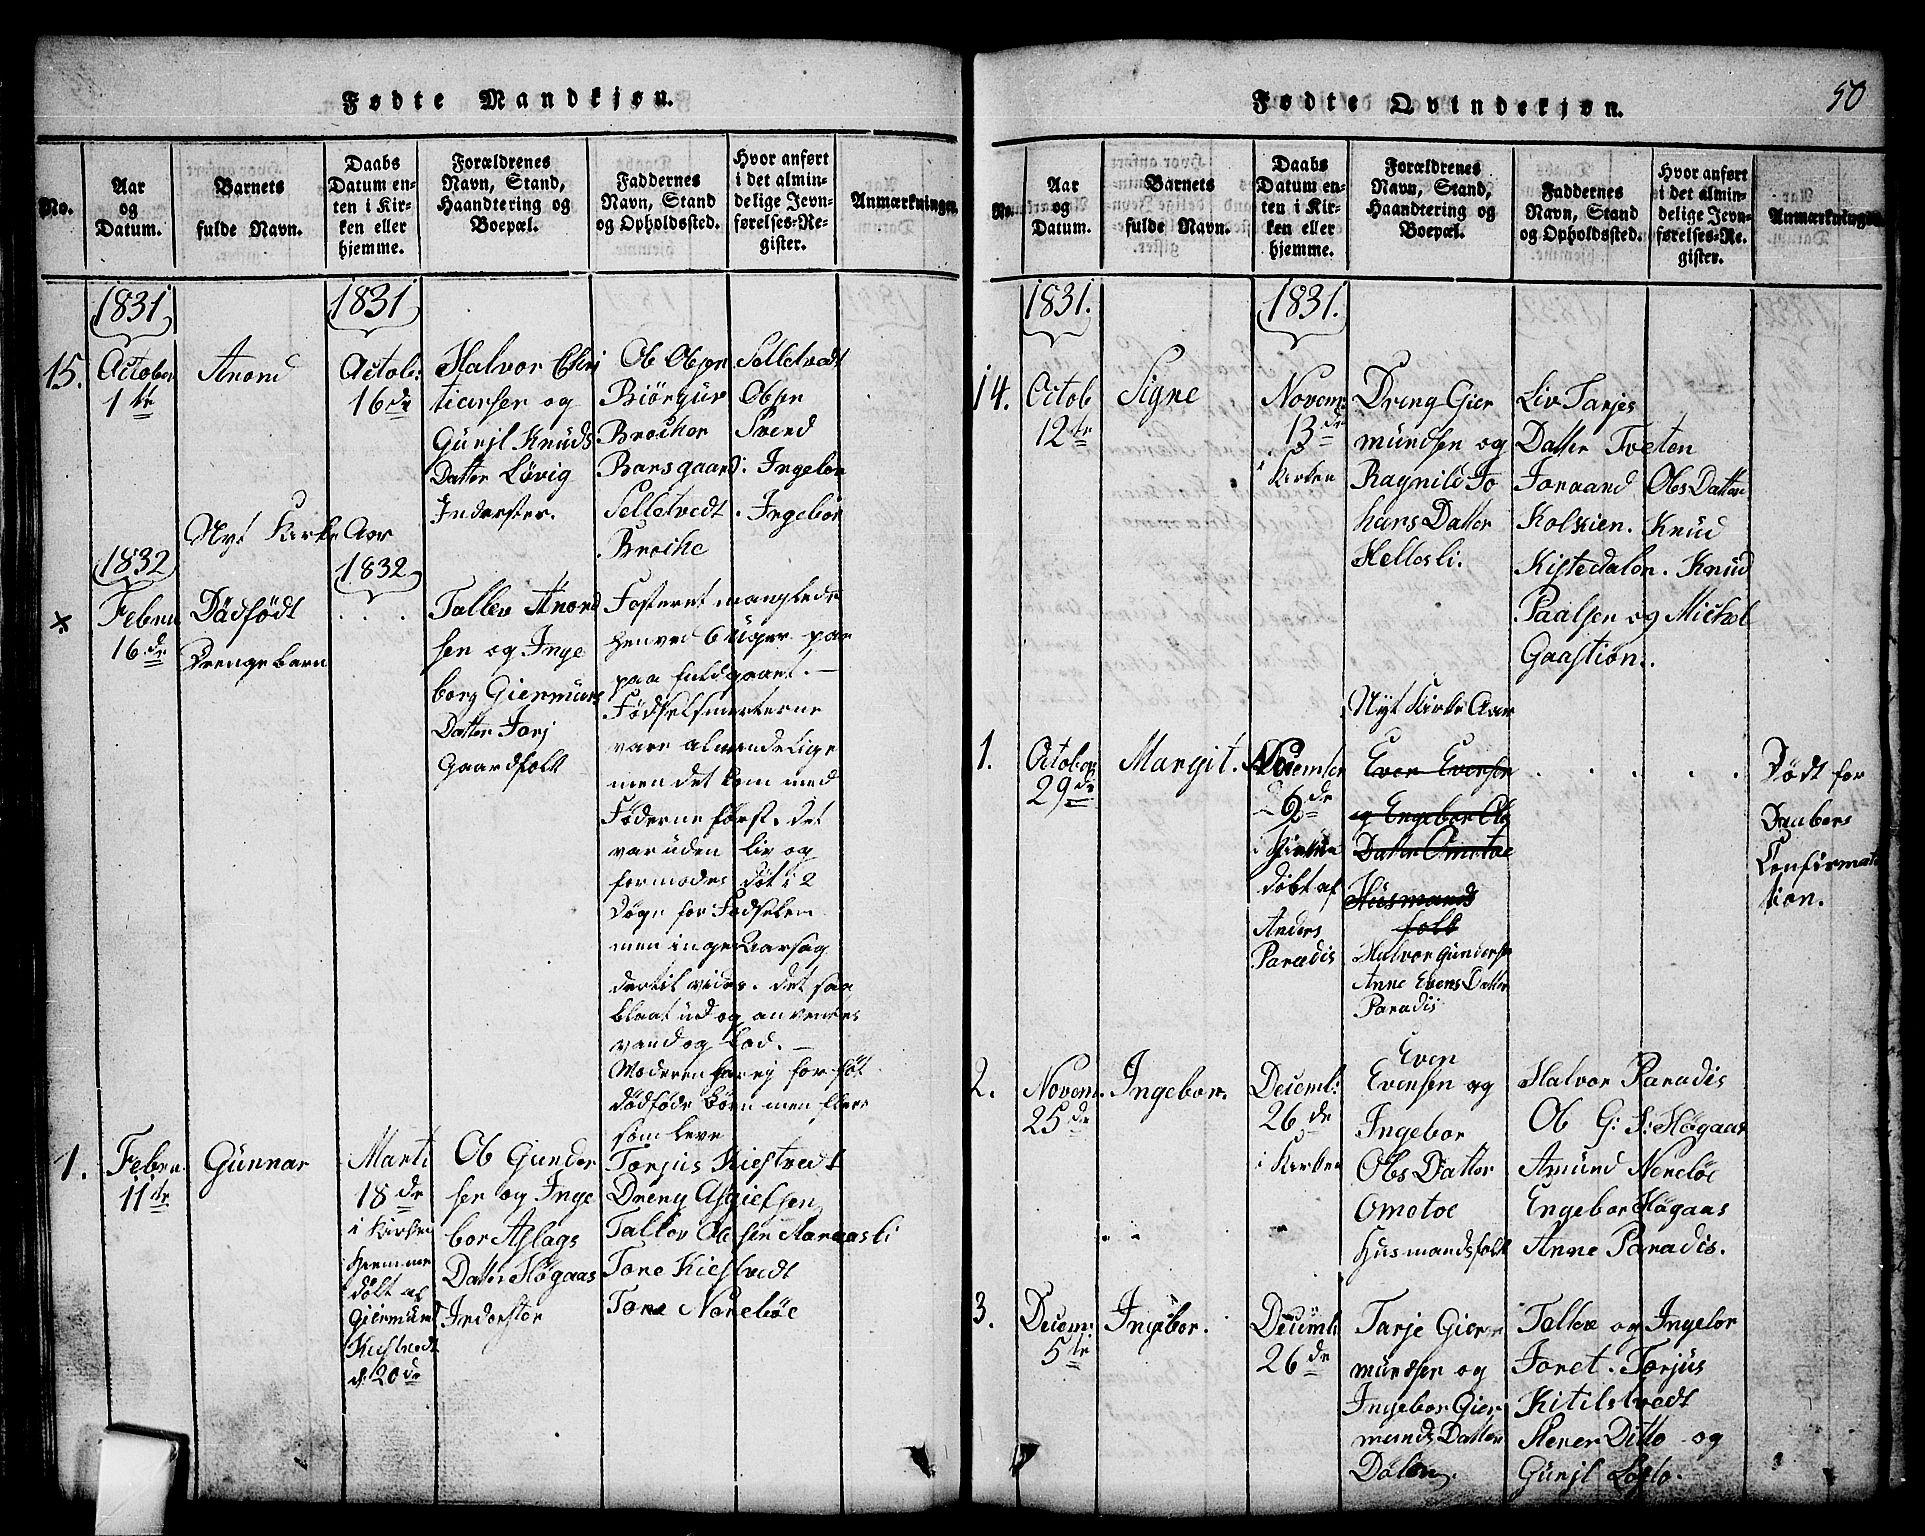 SAKO, Mo kirkebøker, G/Gb/L0001: Klokkerbok nr. II 1, 1814-1843, s. 50